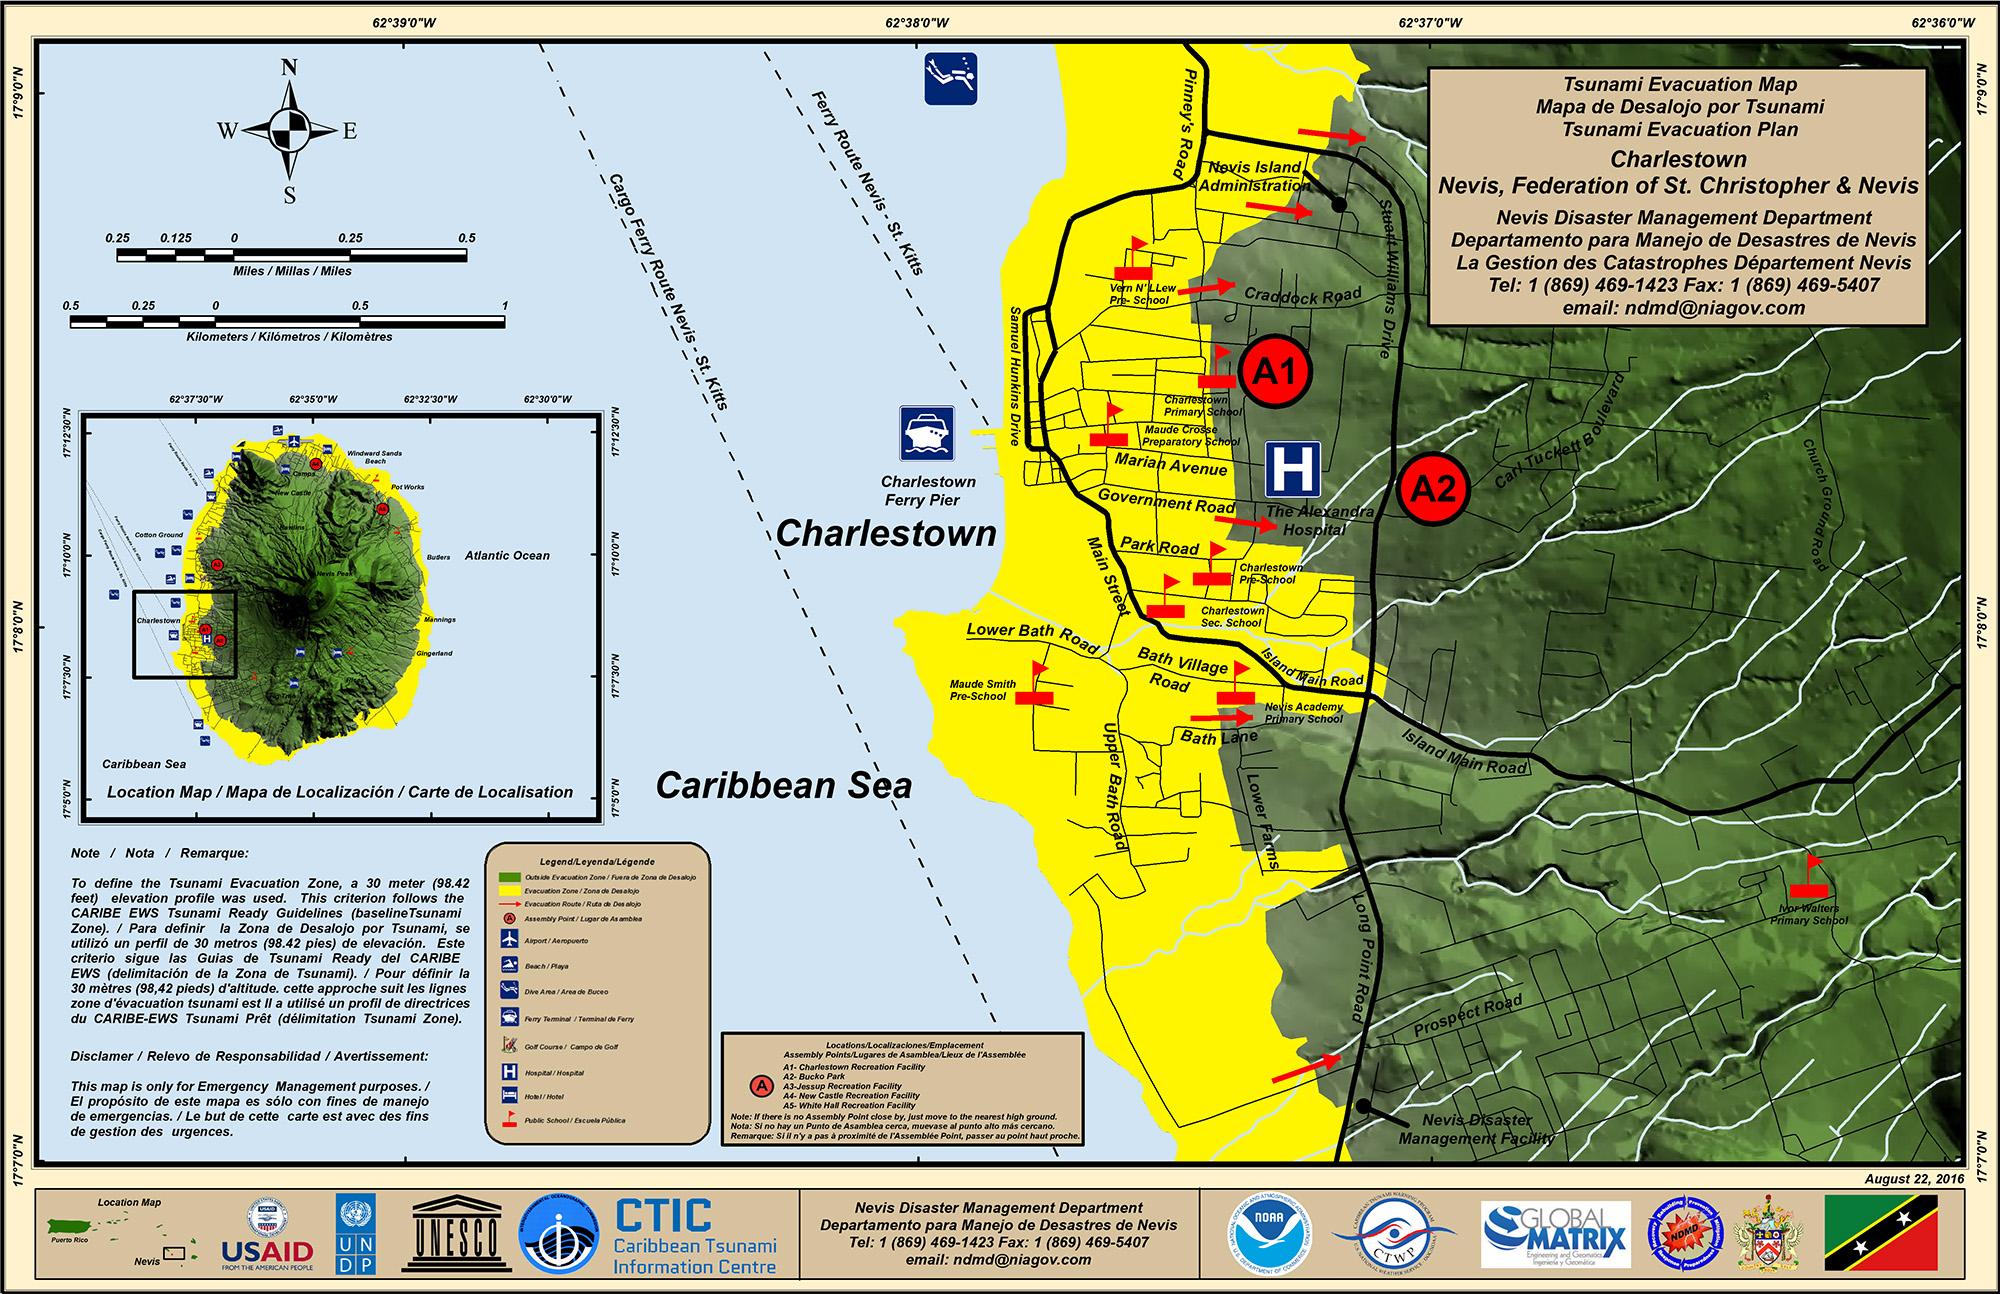 Tsunami - Nevis Disaster Management Department (NDMD)